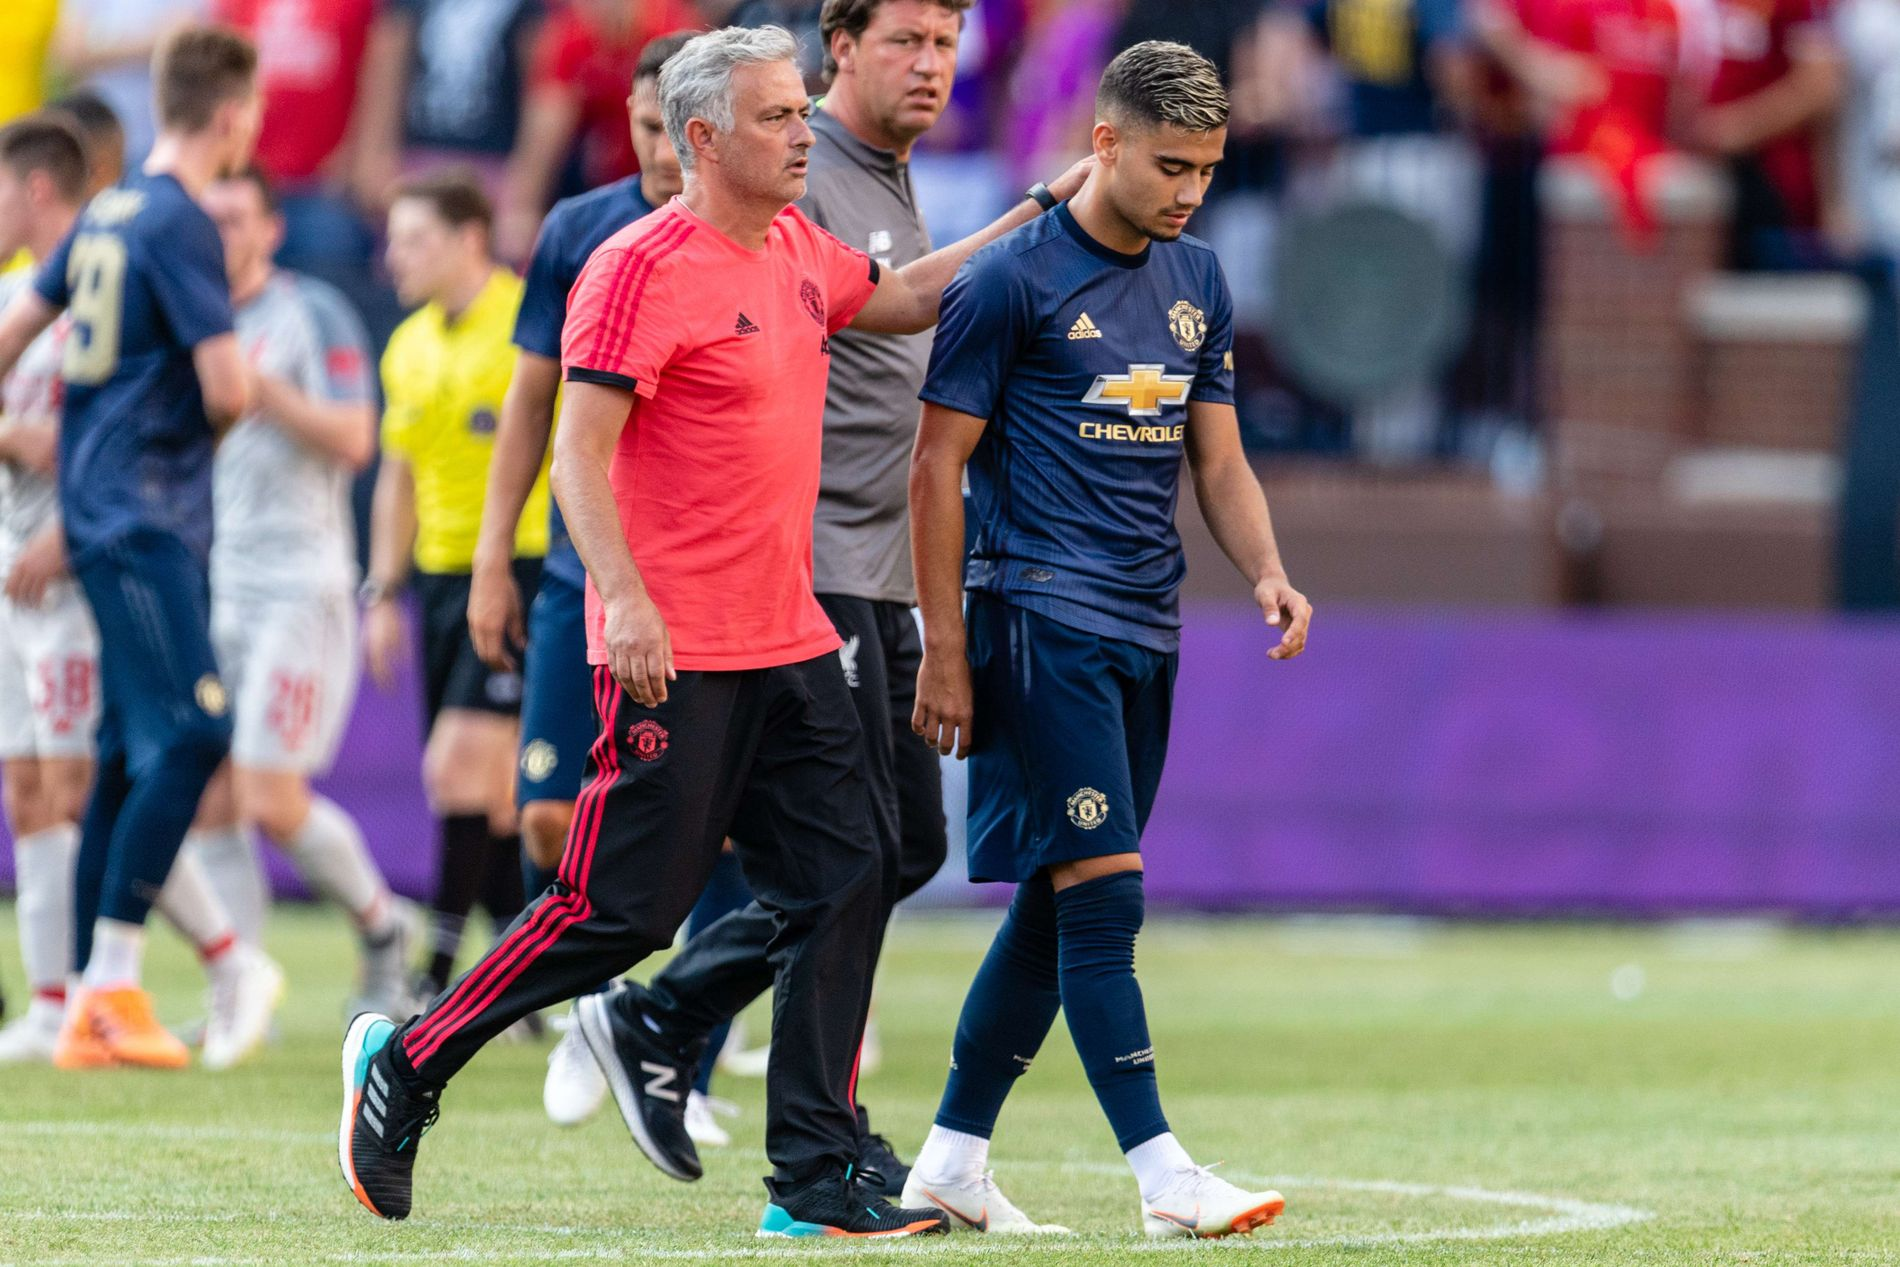 KLAPP PÅ SKULDEREN: Fra sjefen José Mourinho til Andreas Pereira, som scoret Manchester Uniteds eneste mål mot Liverpool natt til søndag norsk tid.